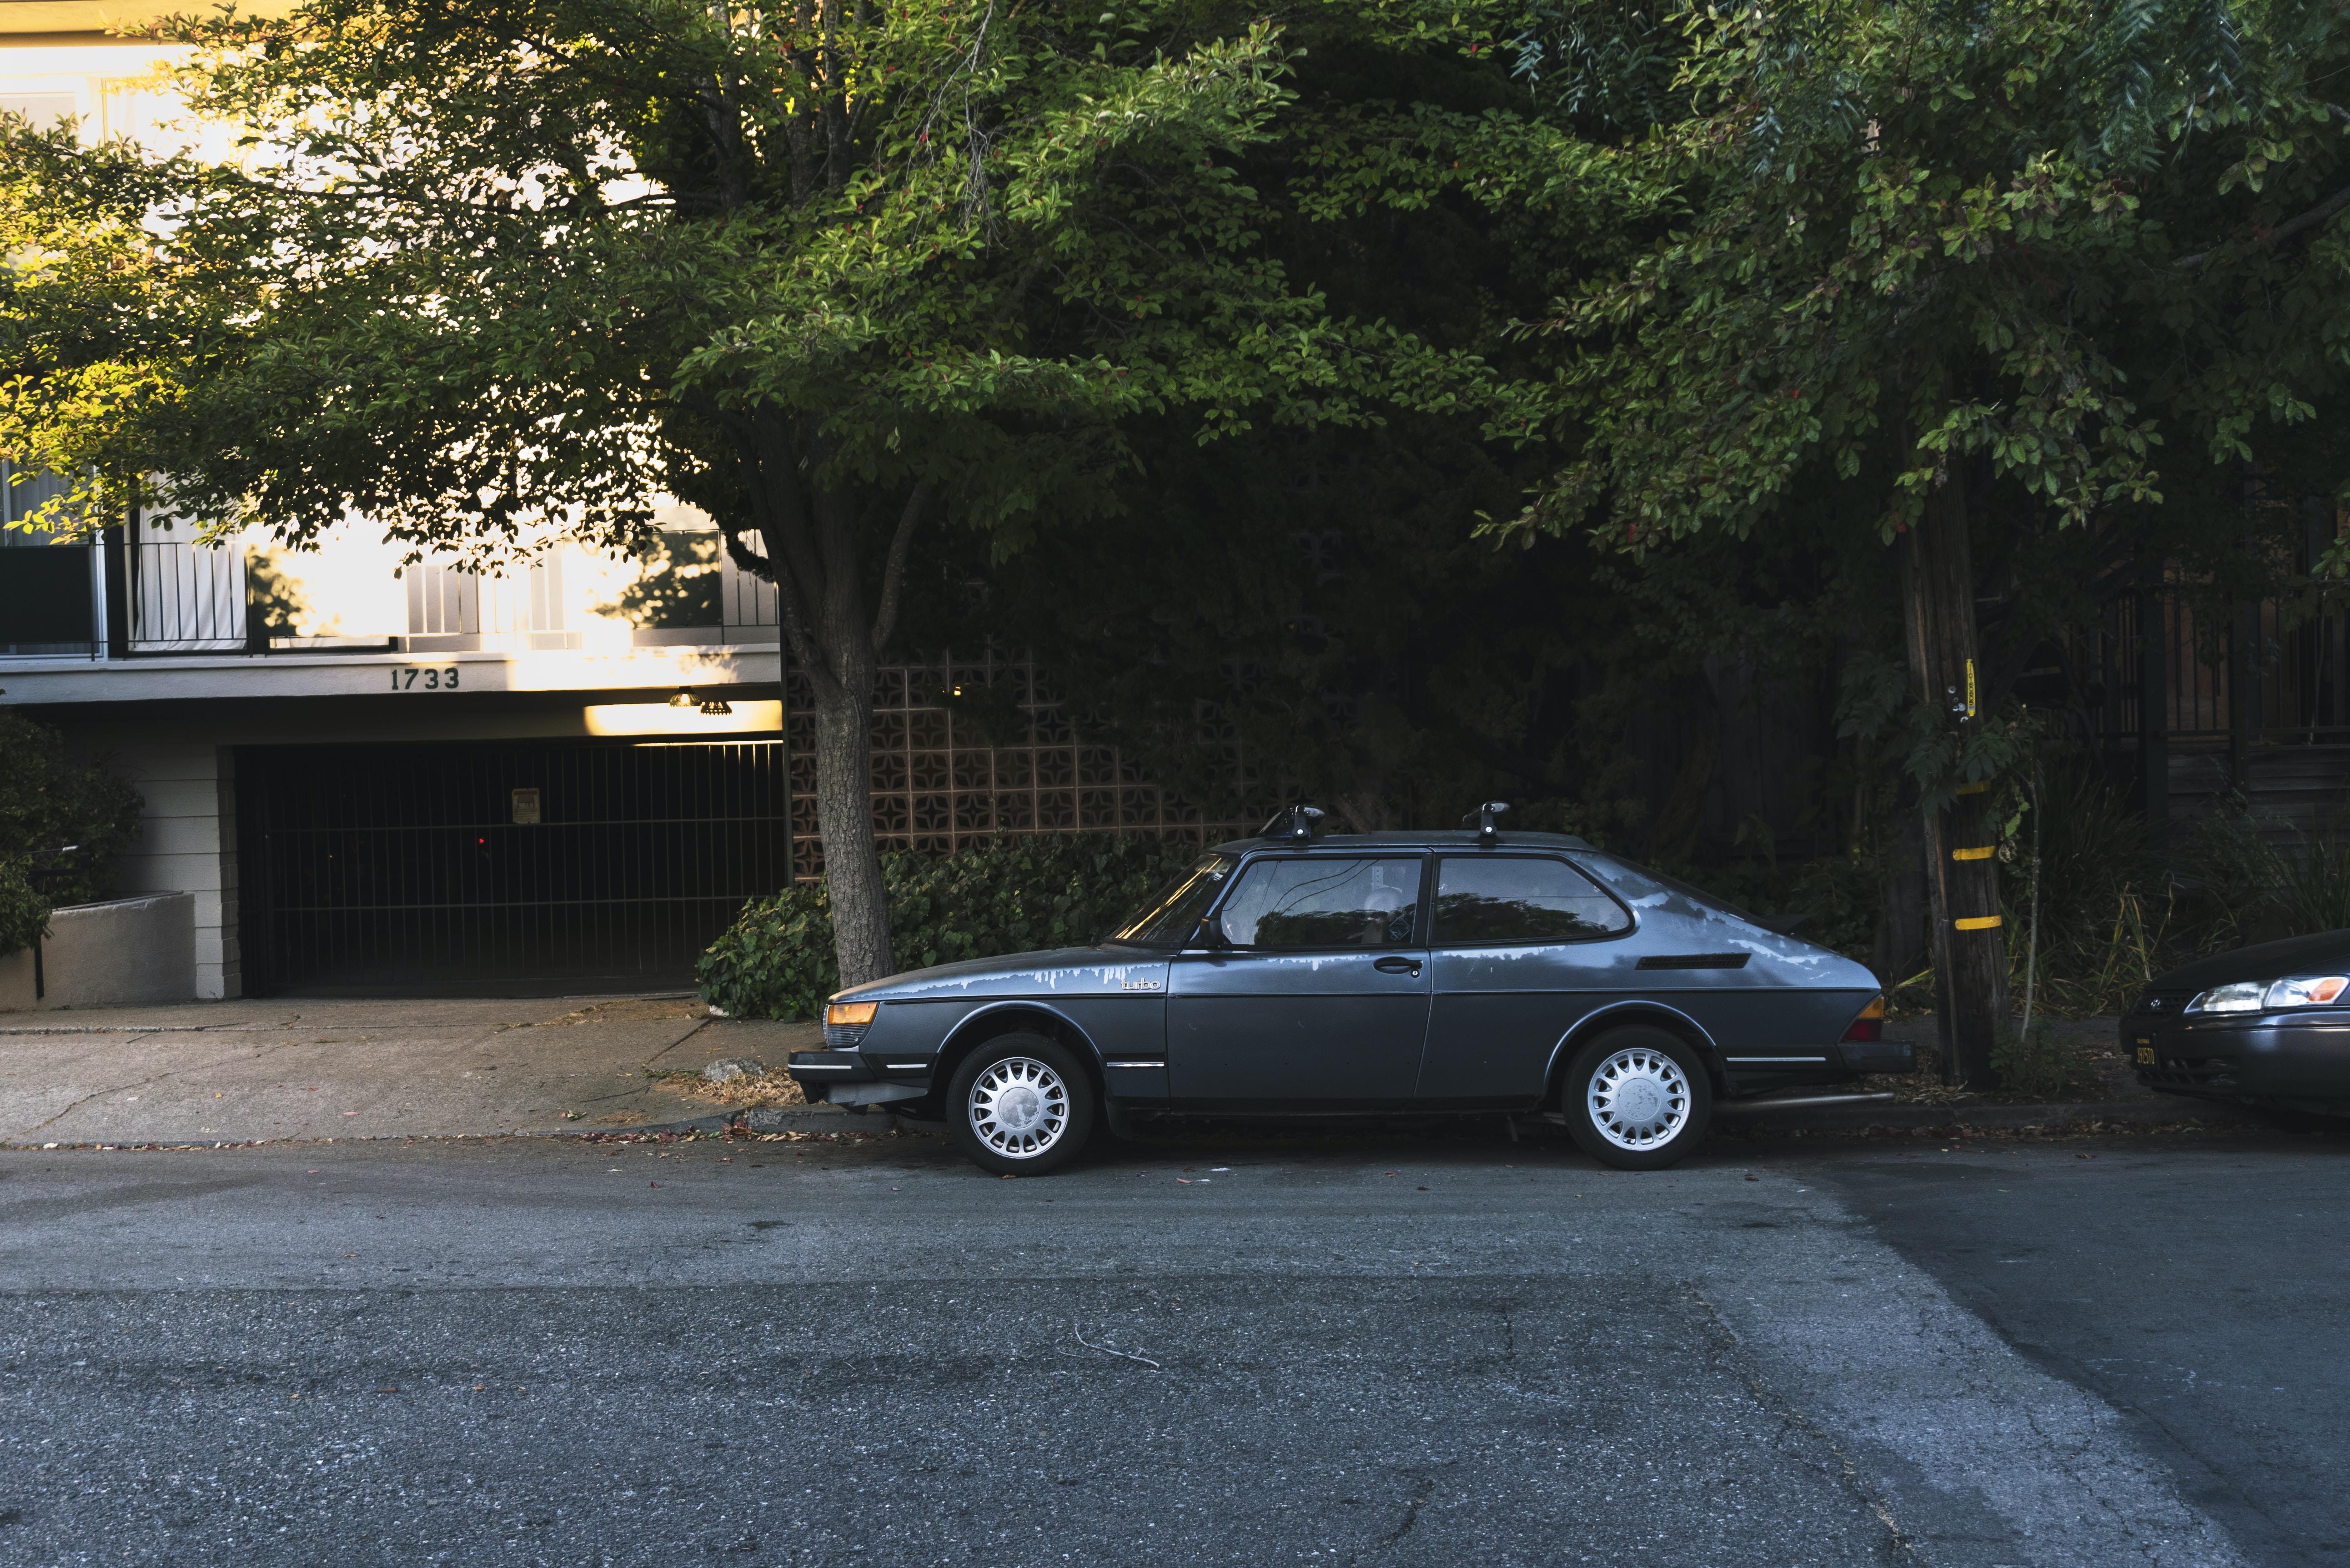 black sedan parked under the tree during daytime